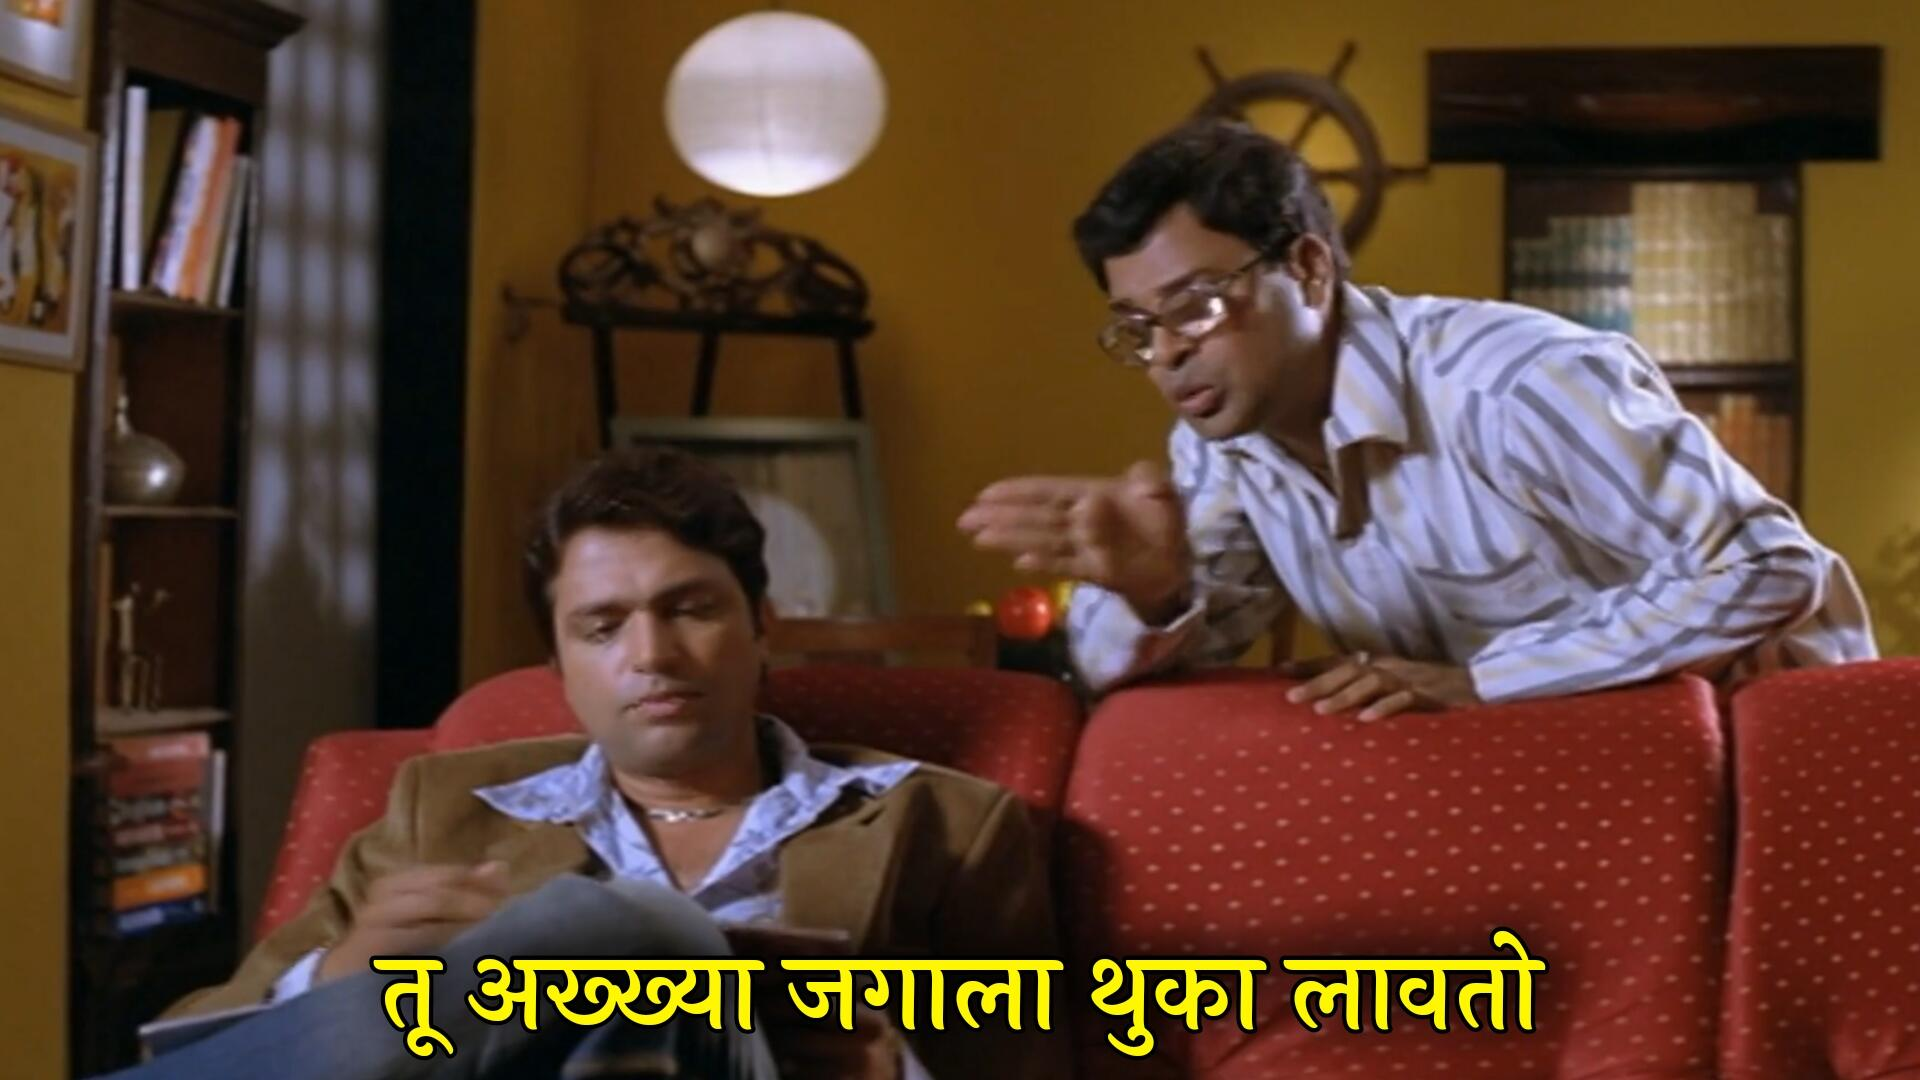 Marathi Meme Templates